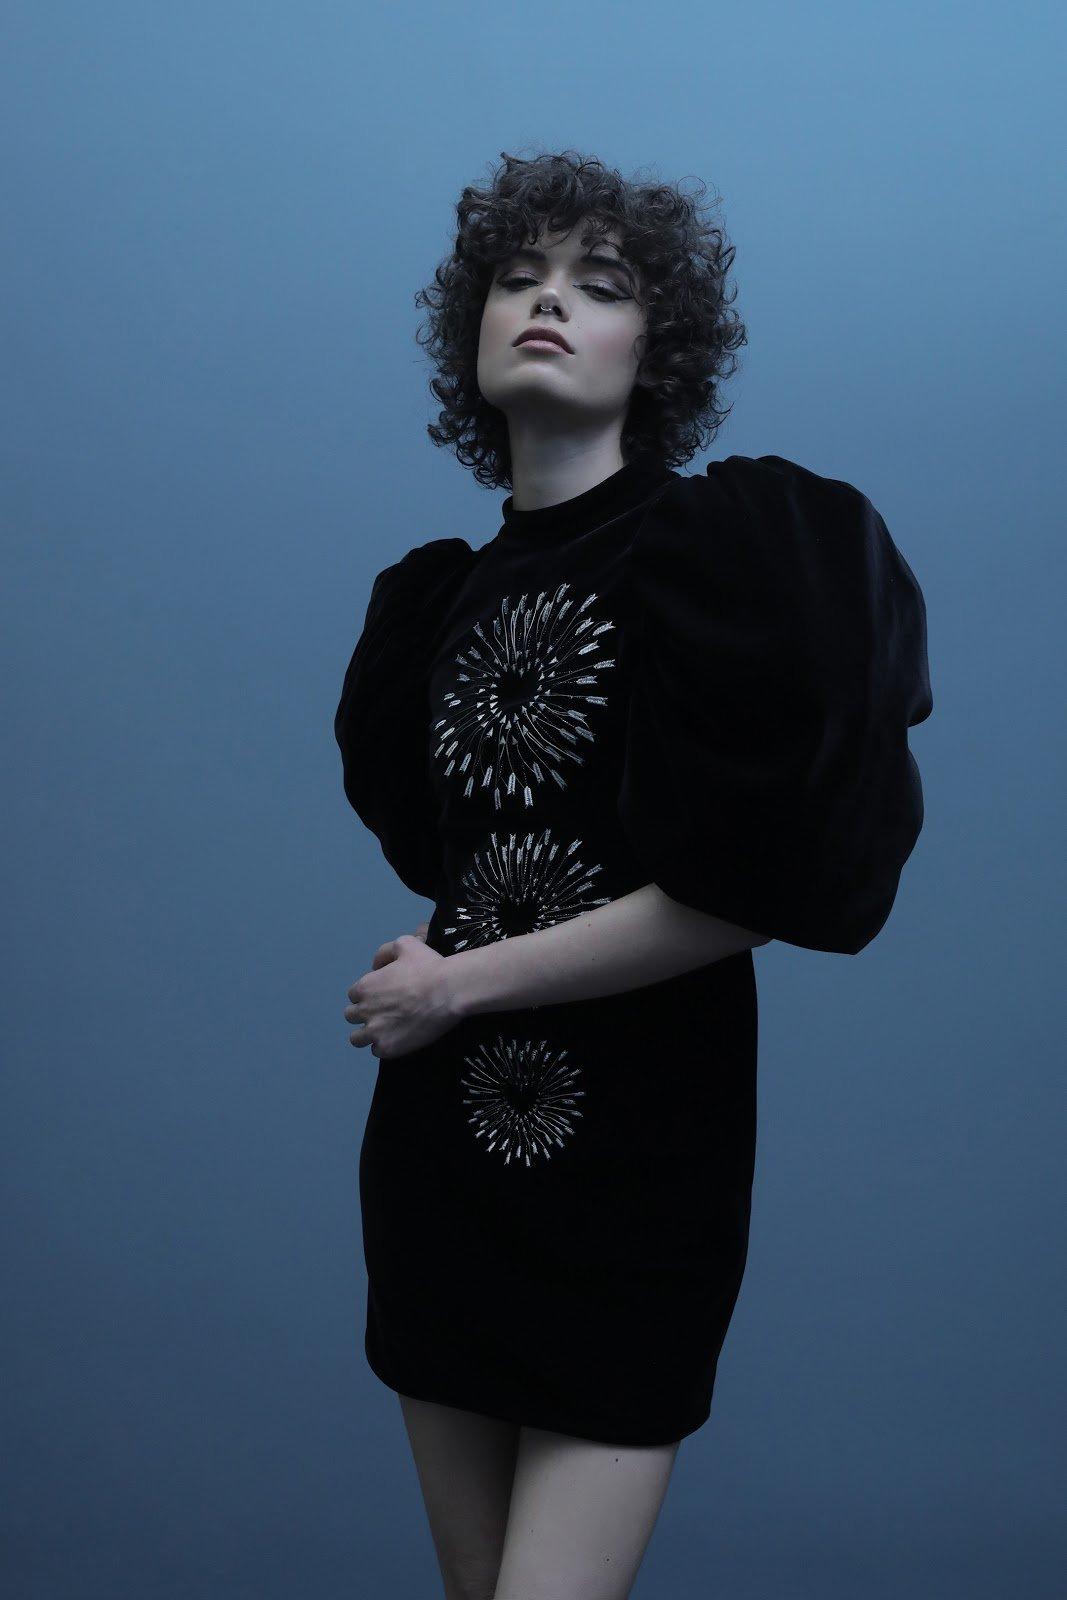 Model in black dress posing against blue background